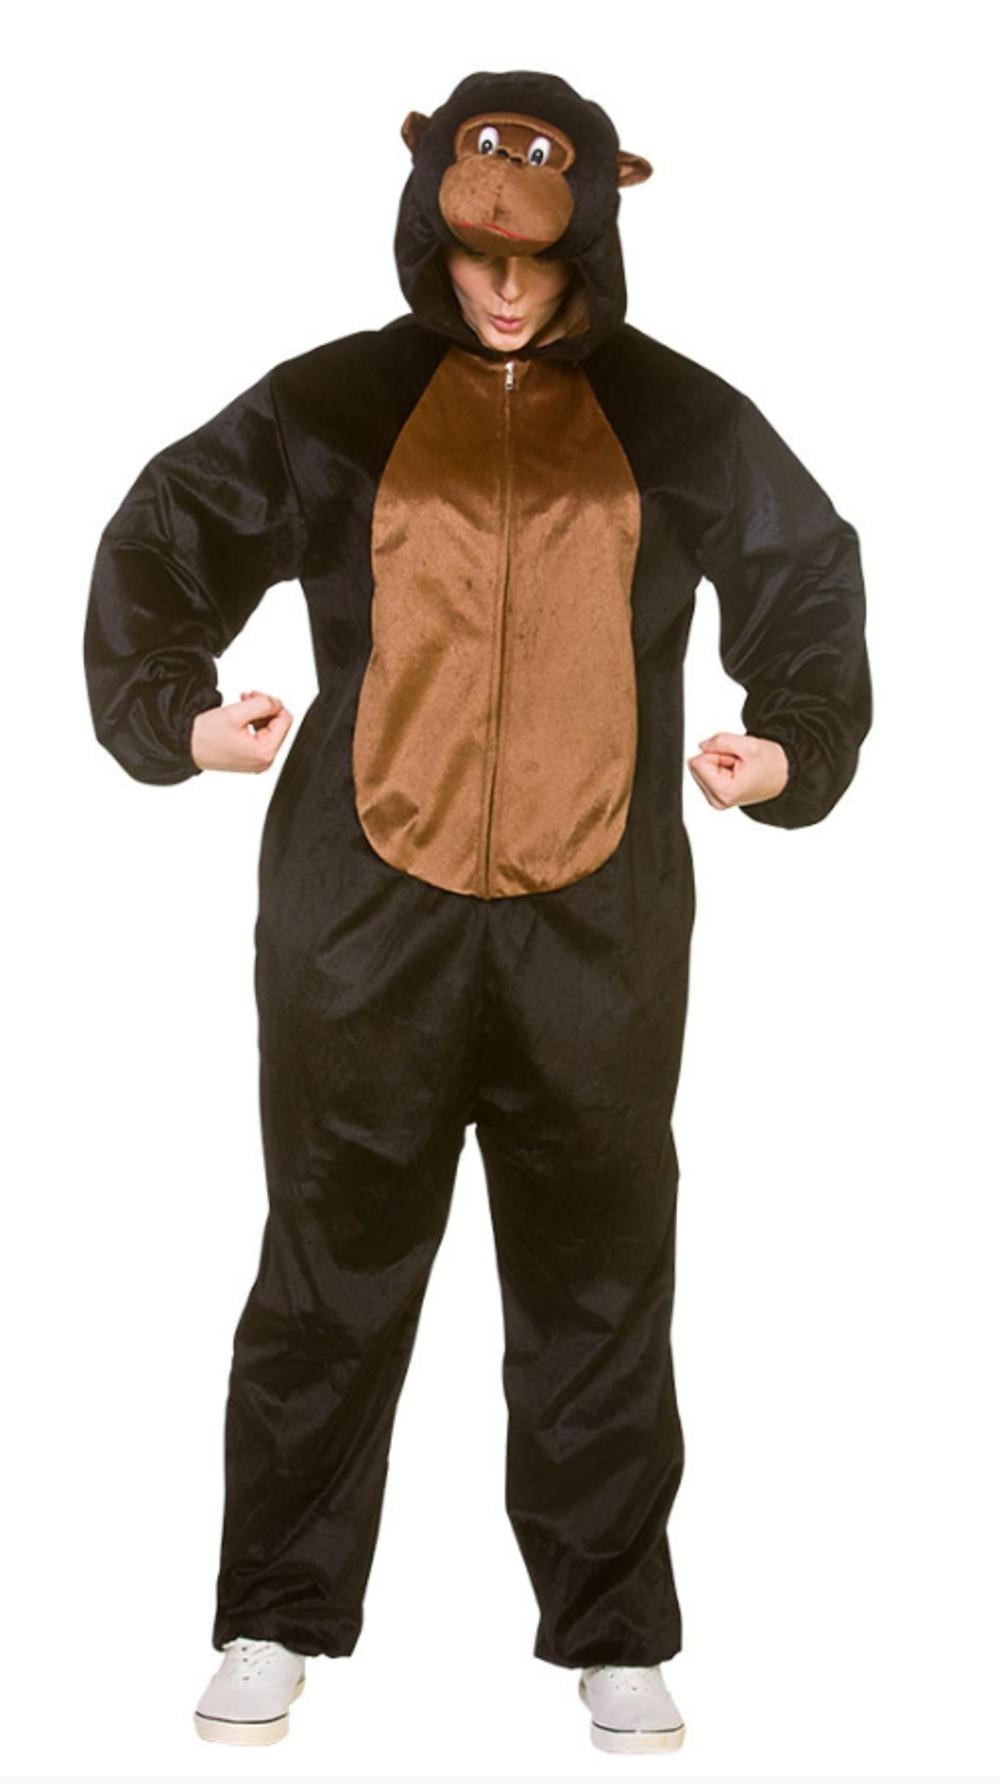 Deluxe Gorilla Adults Costume